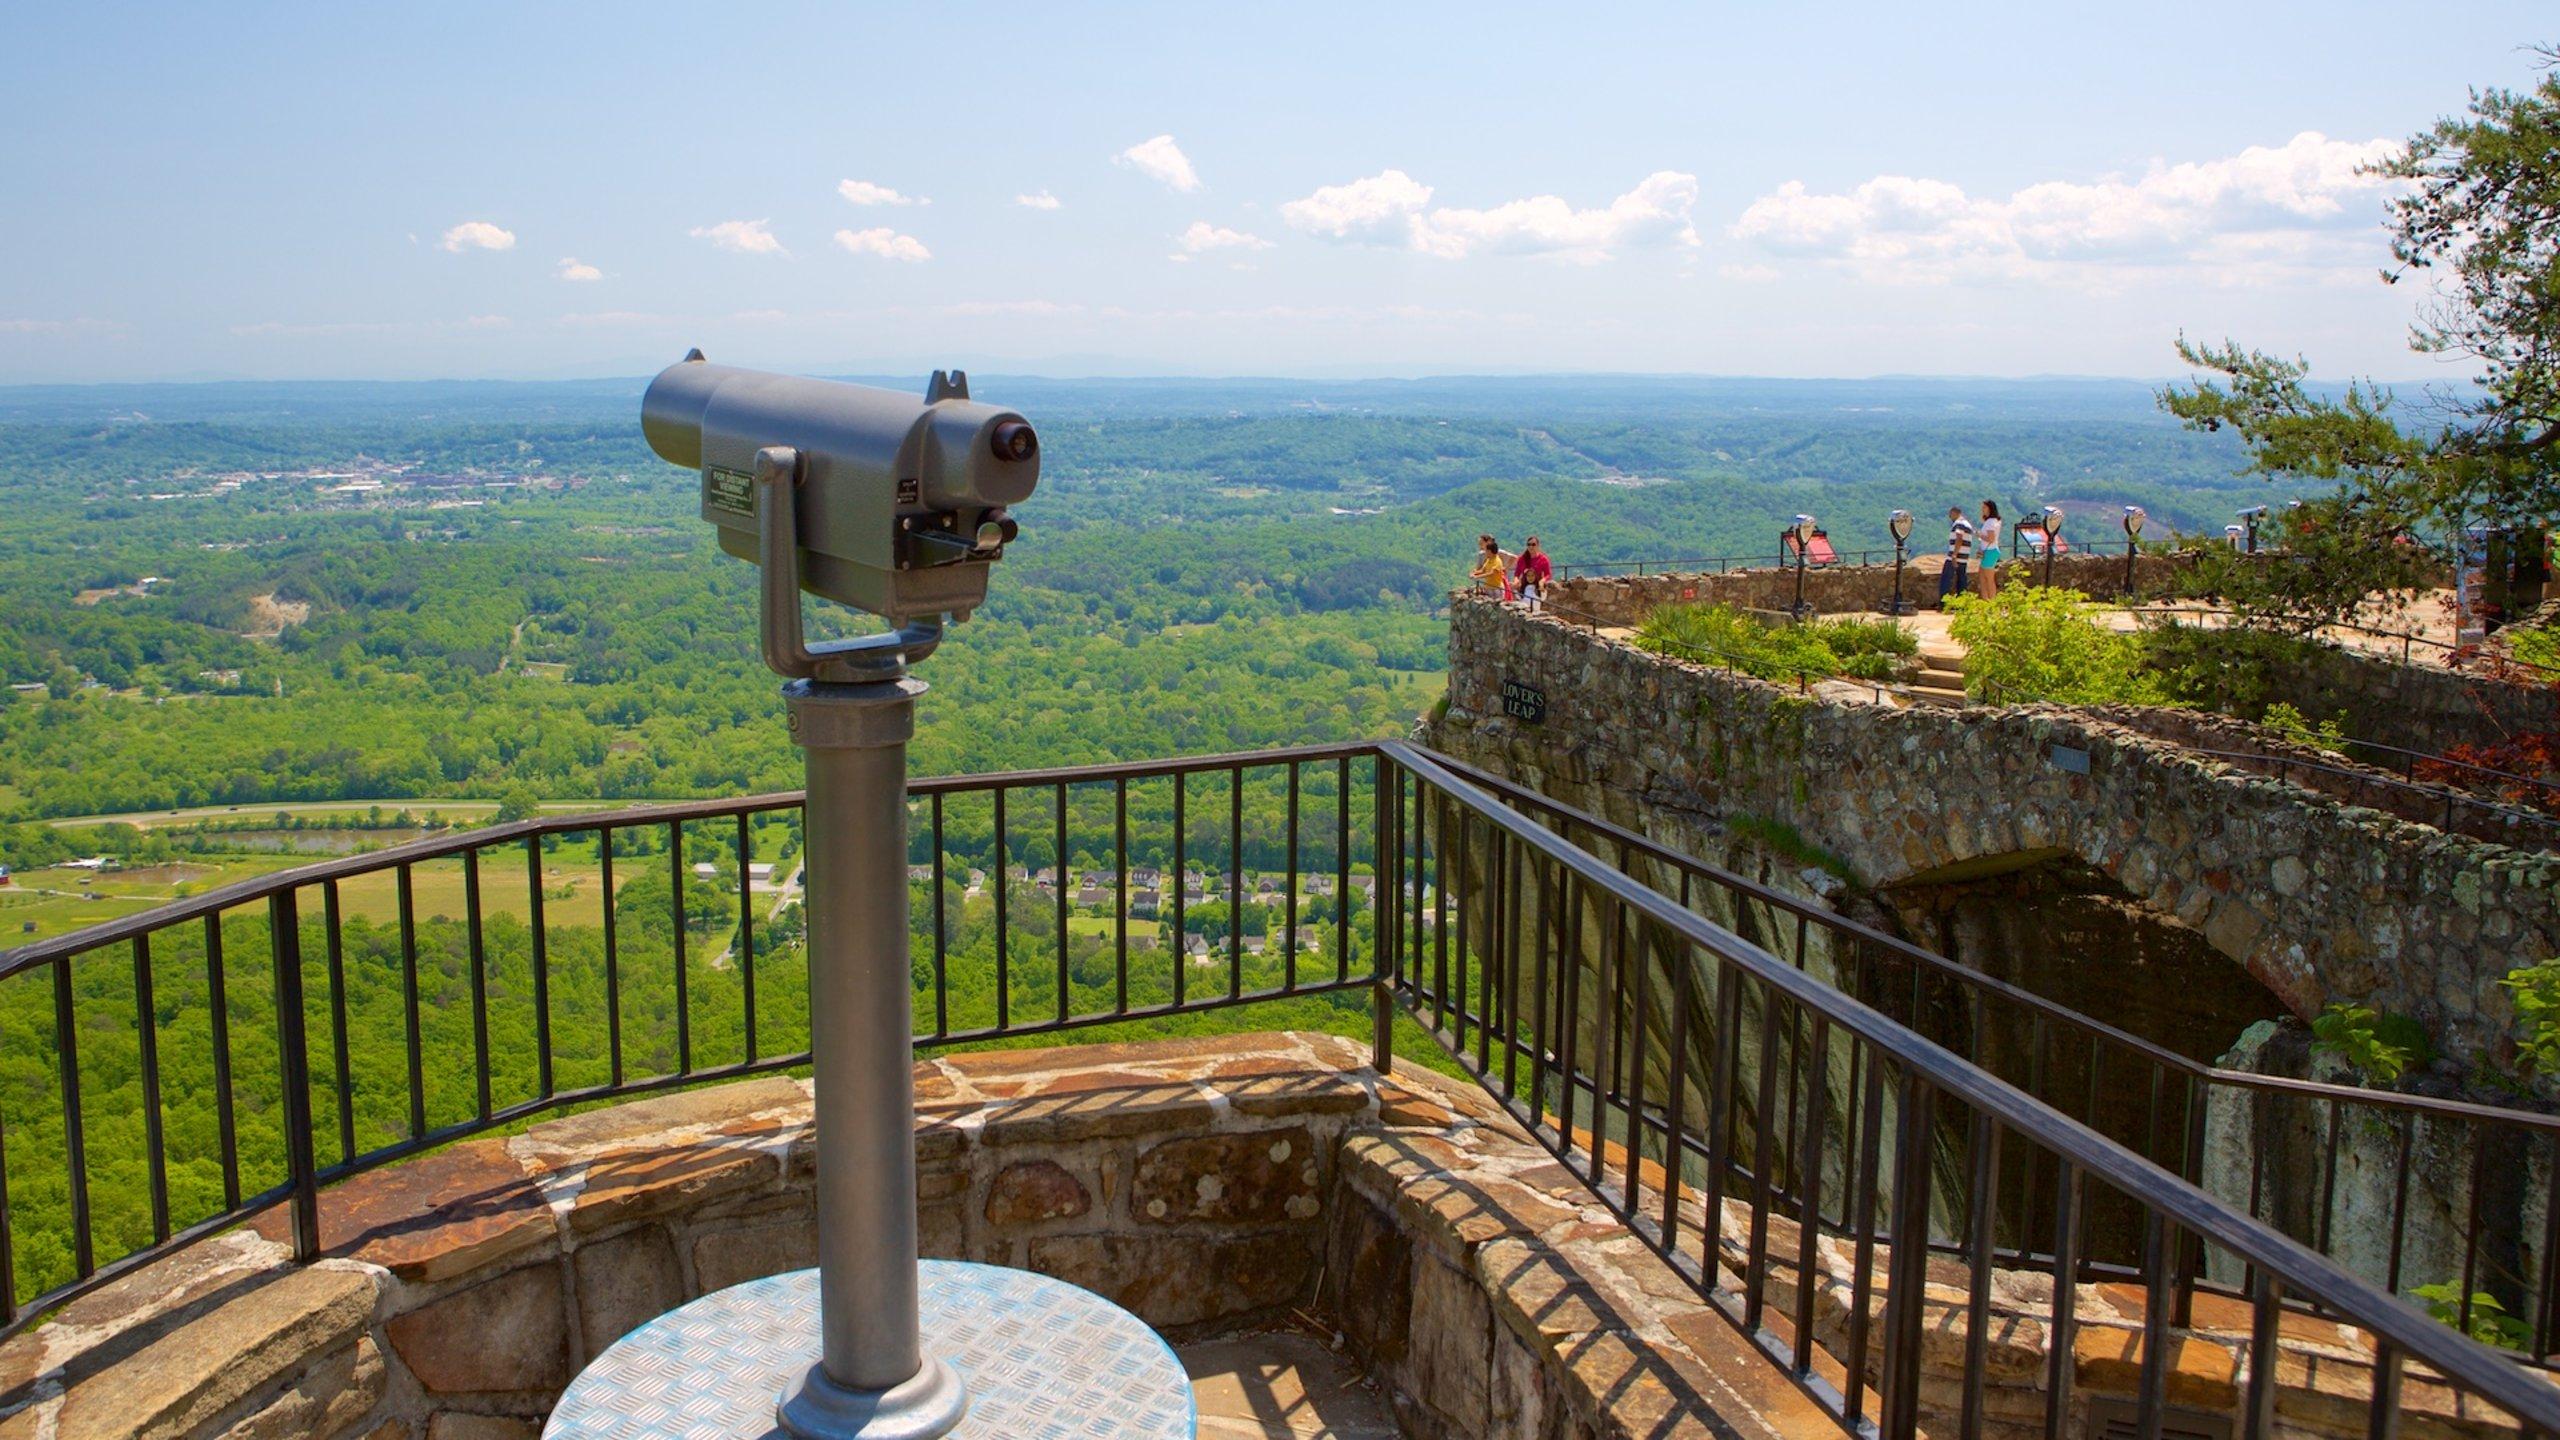 Northwest High Country, Georgia, United States of America